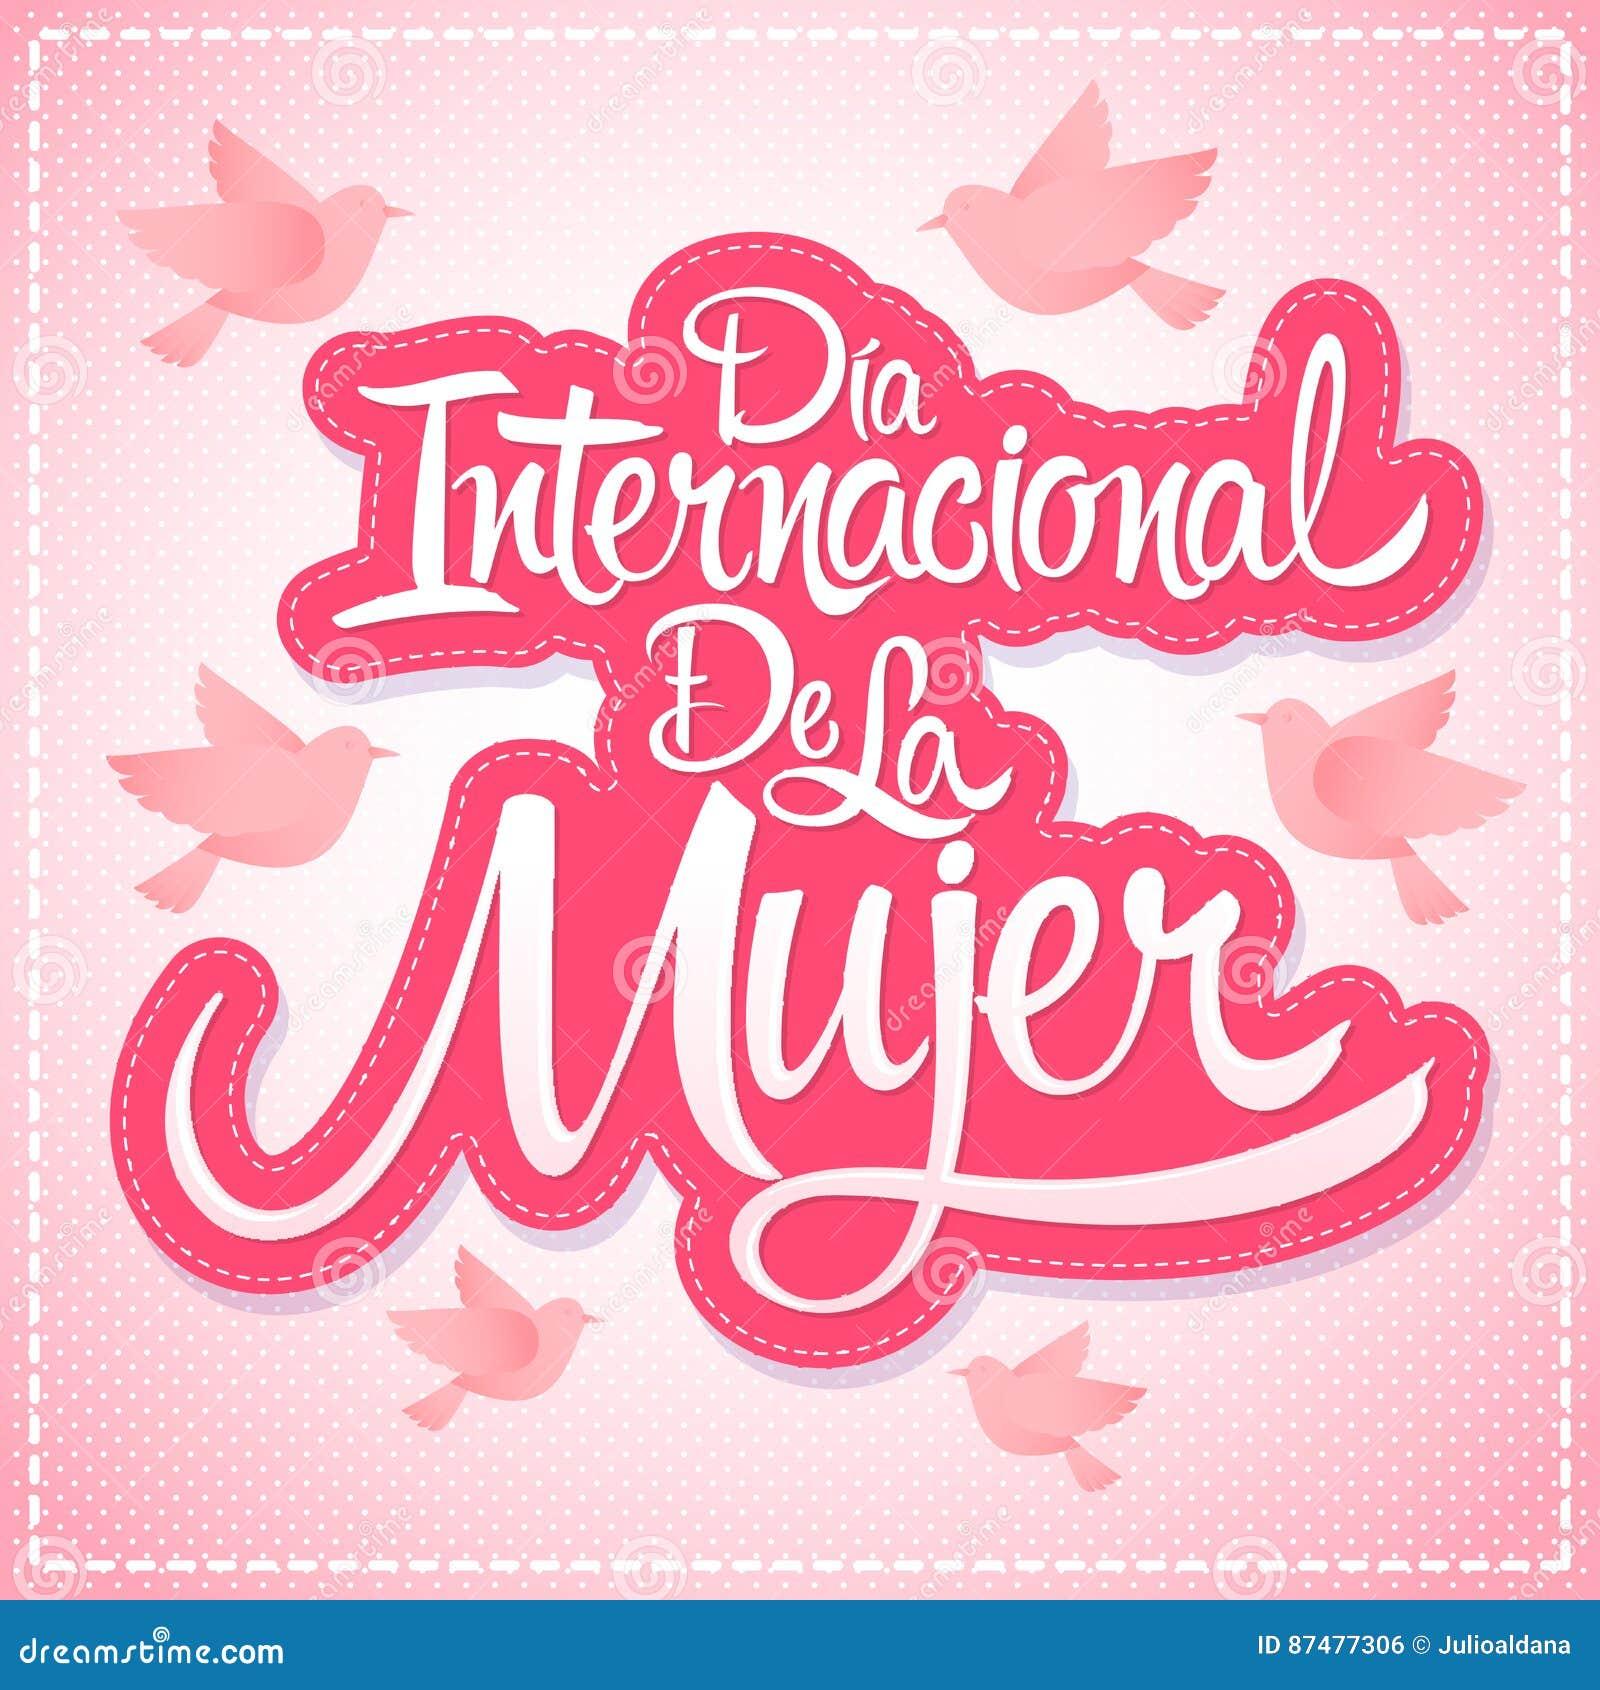 Dia internacional de la Mujer, Spanish translation: International womens day